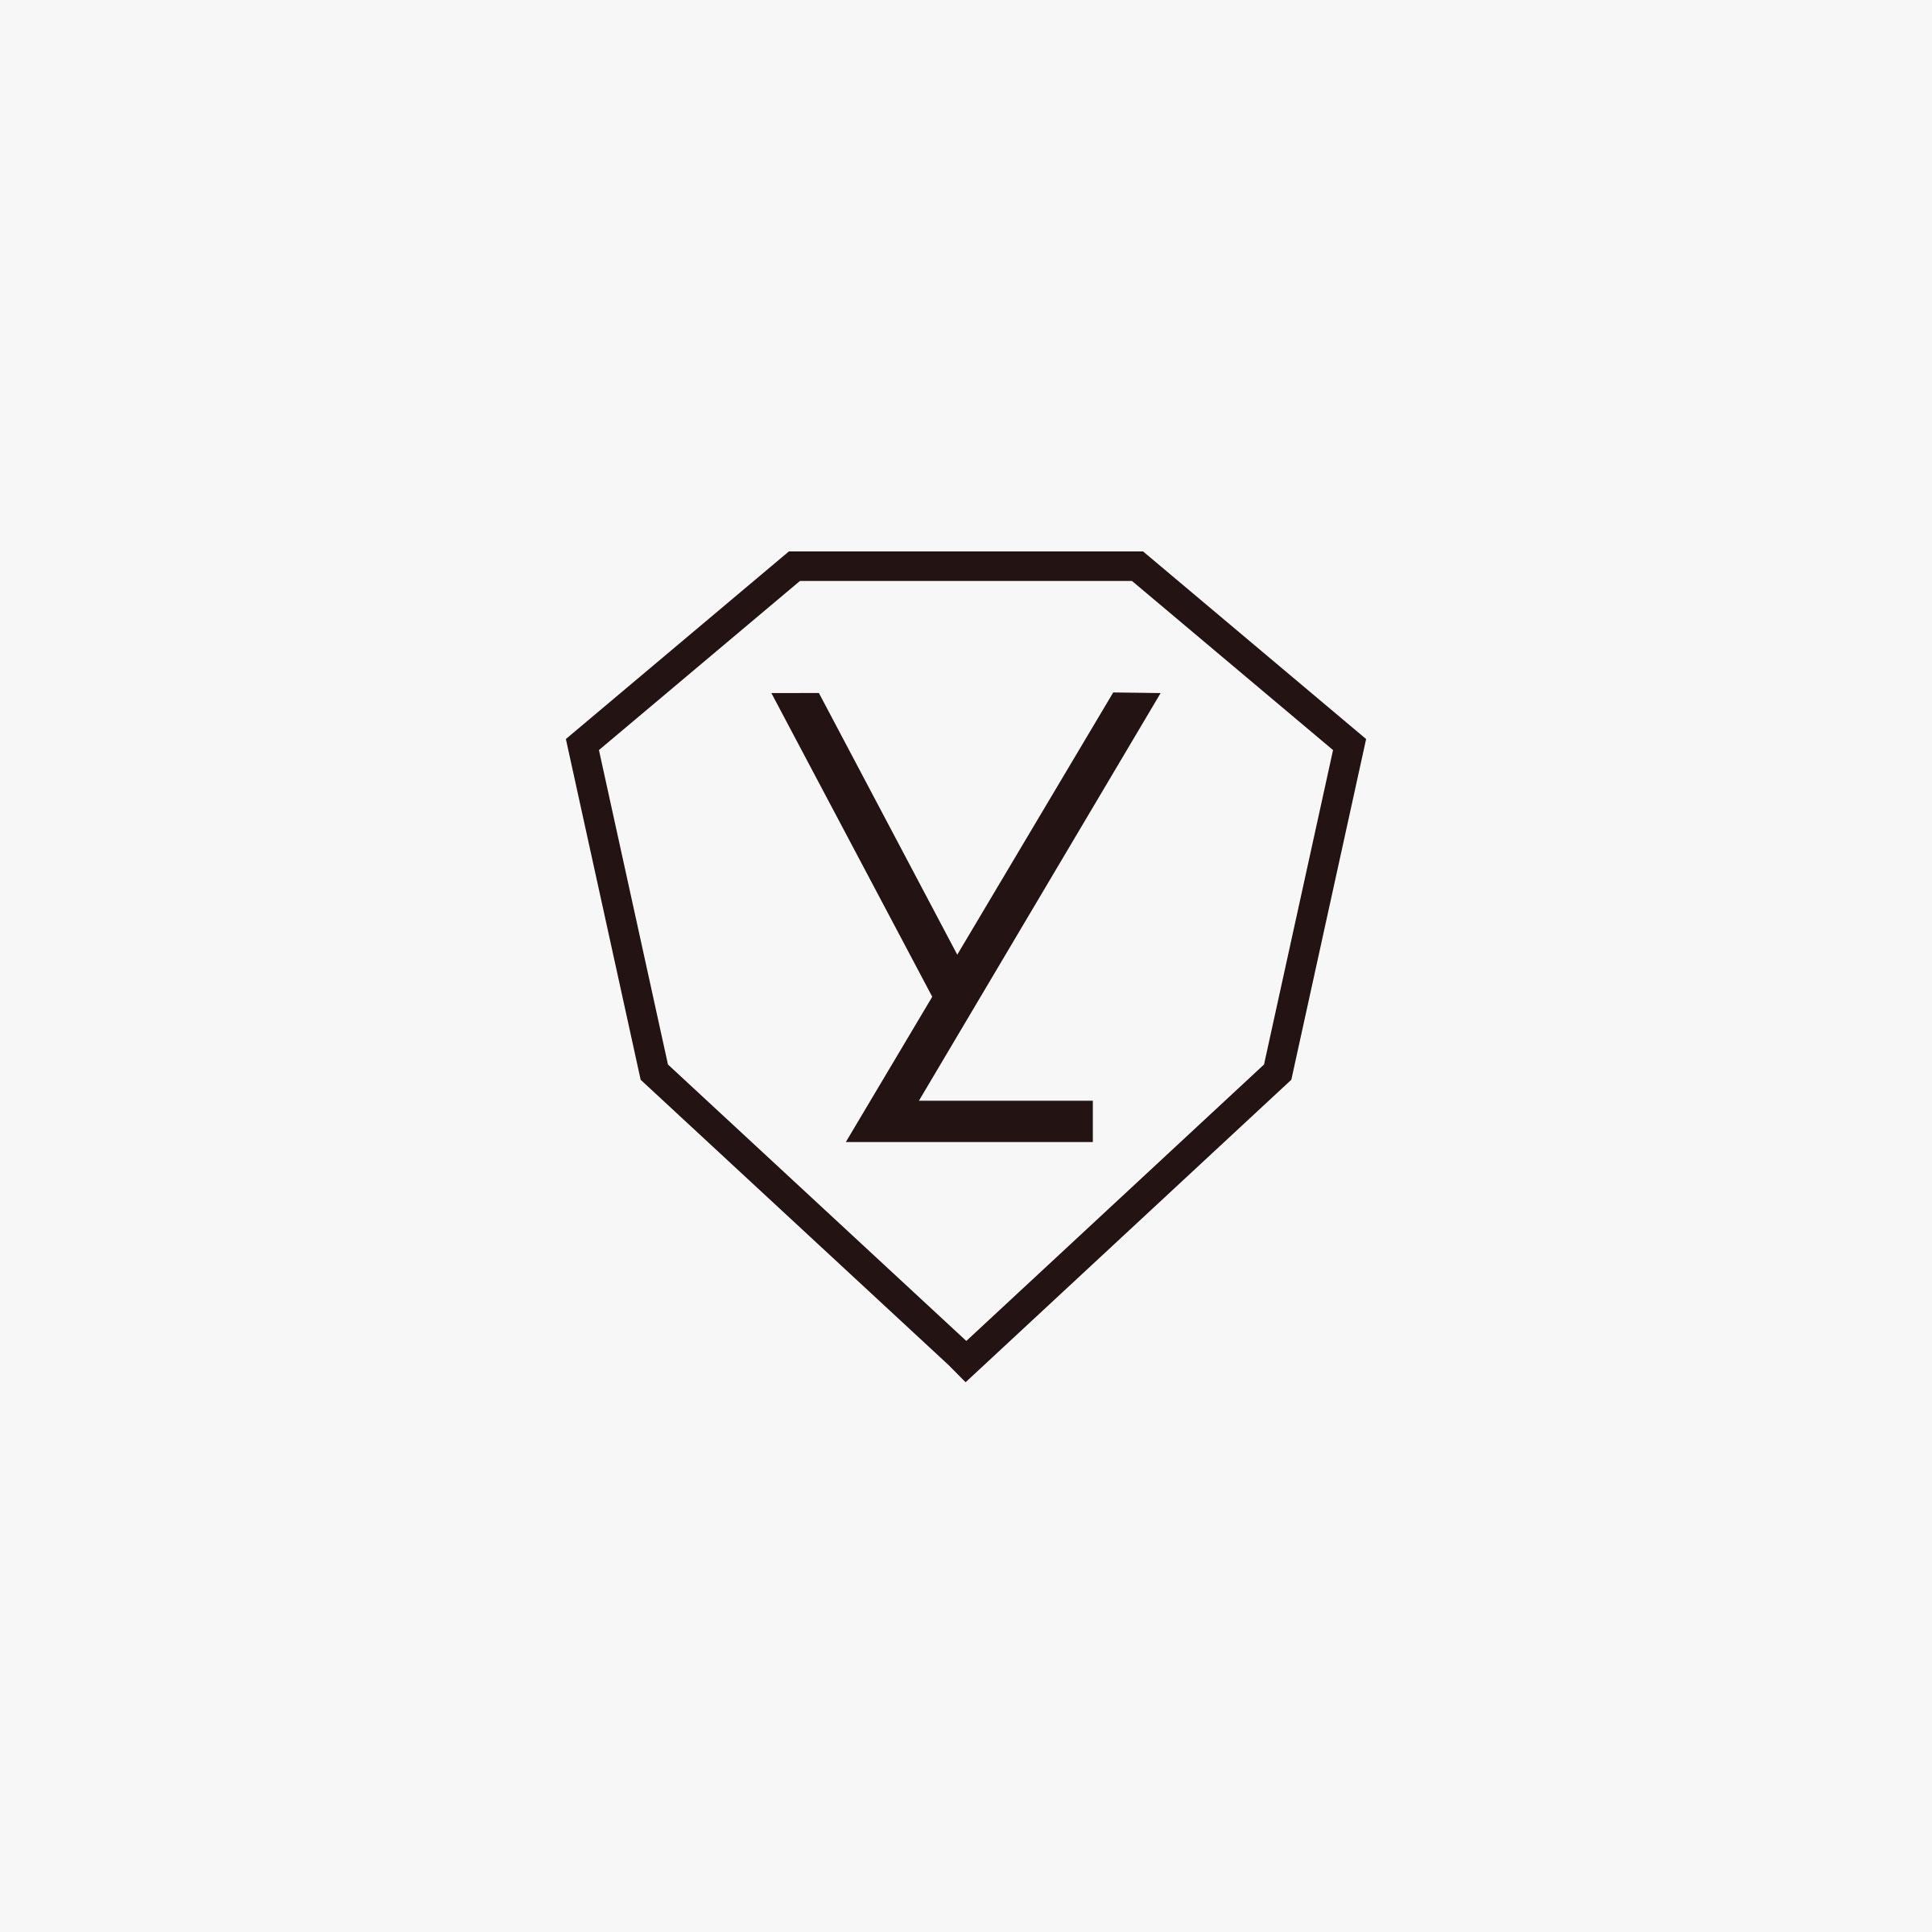 vlopz-logo-design-by-create.jpg